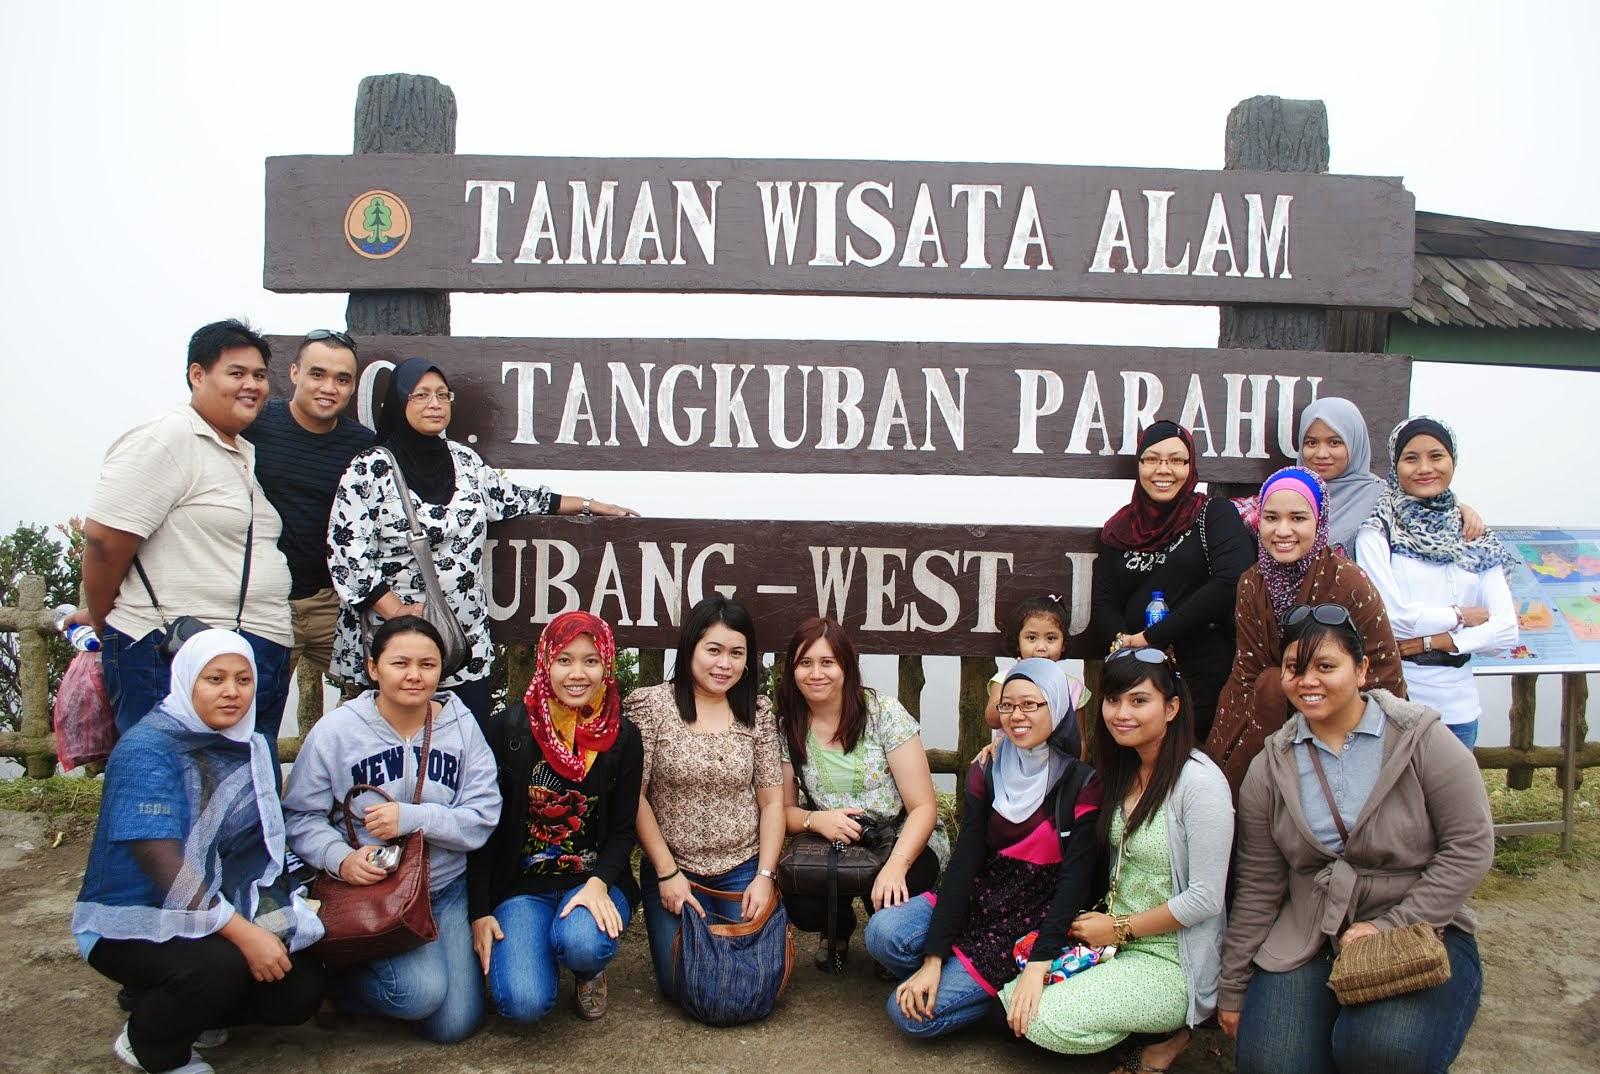 Bandung 10-2010